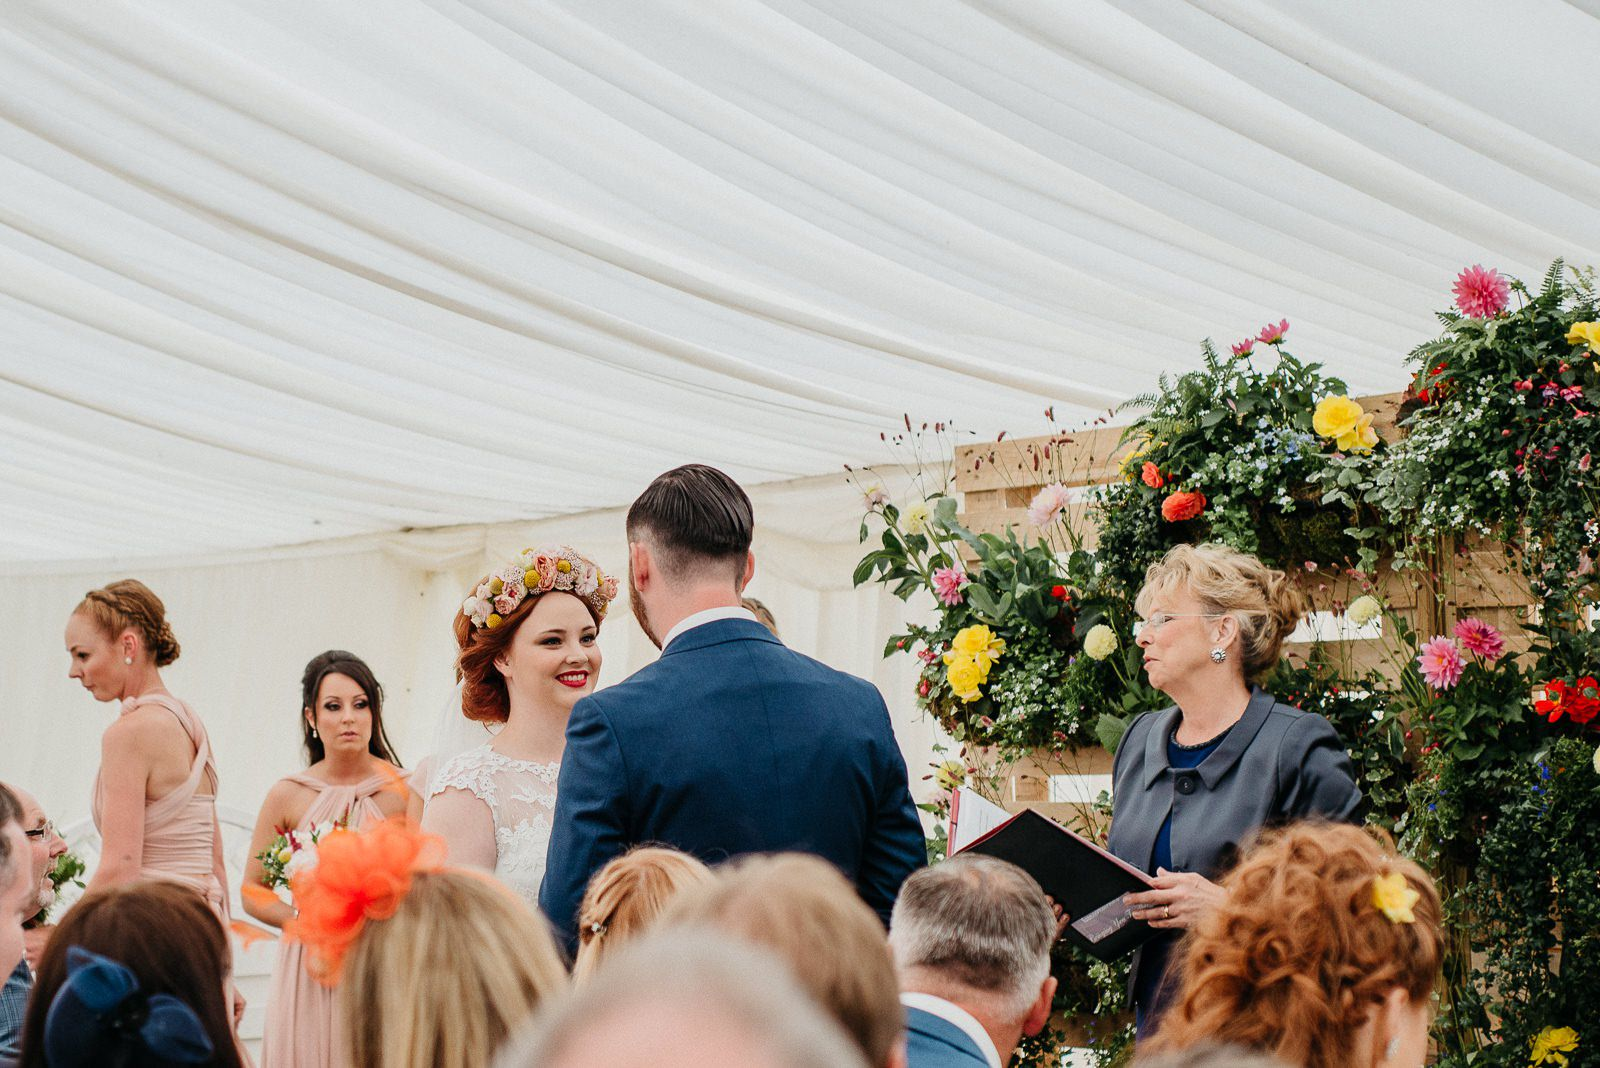 Bride smiling at groom at beginning of wedding ceremony